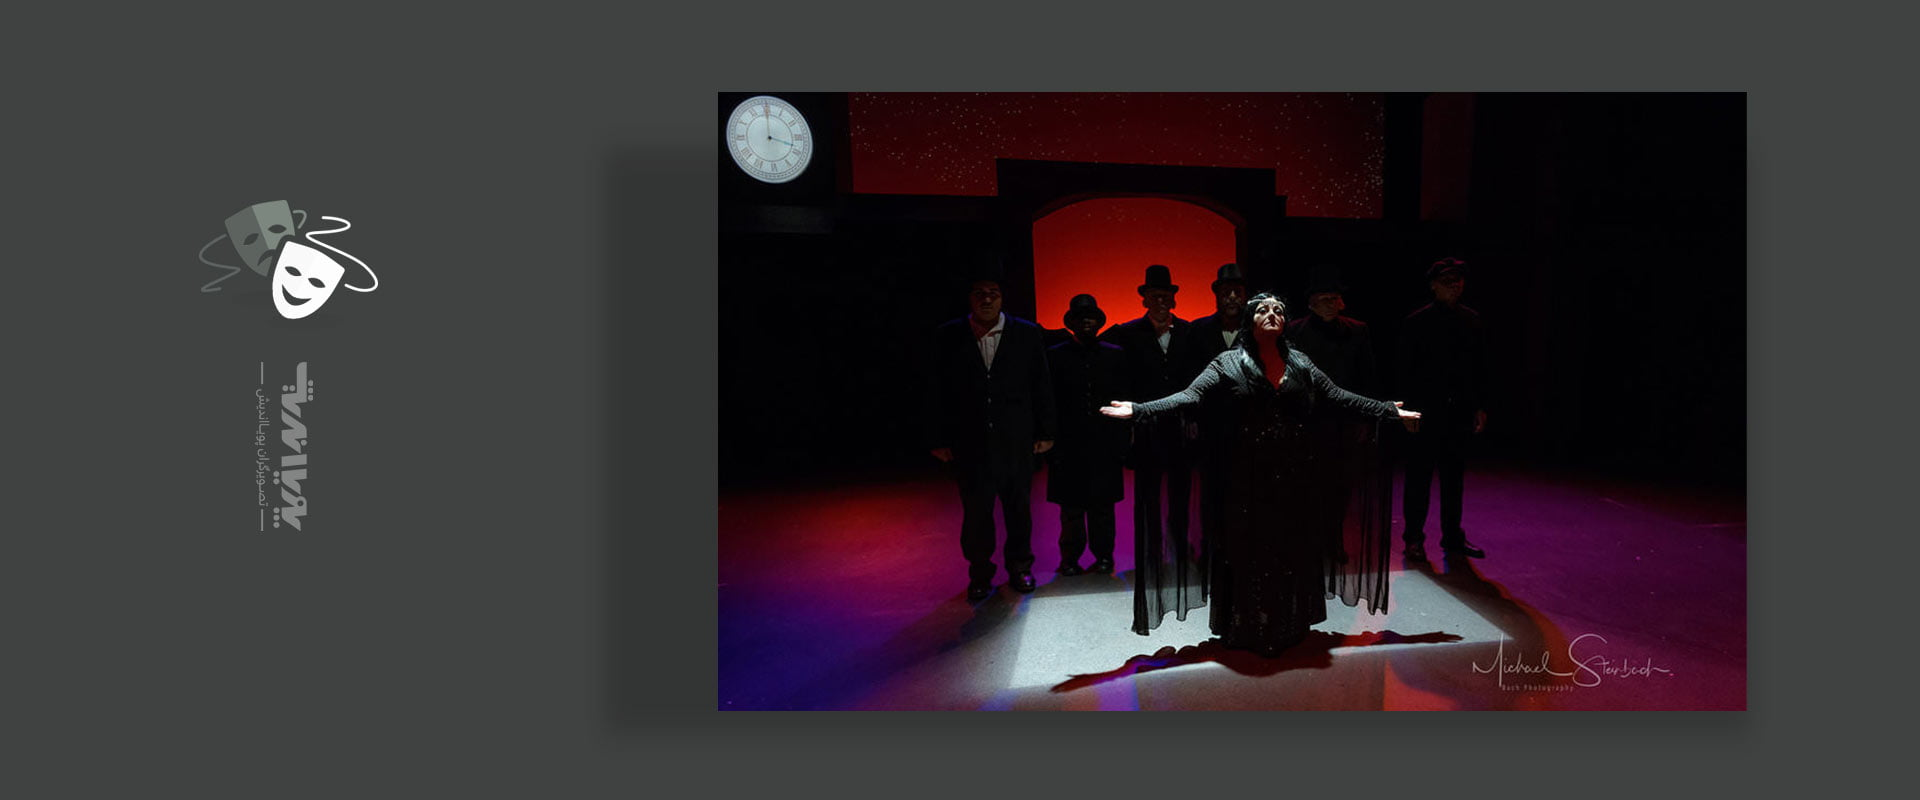 theatre photography 2 - نکات مهم برای عکاسی از تئاتر